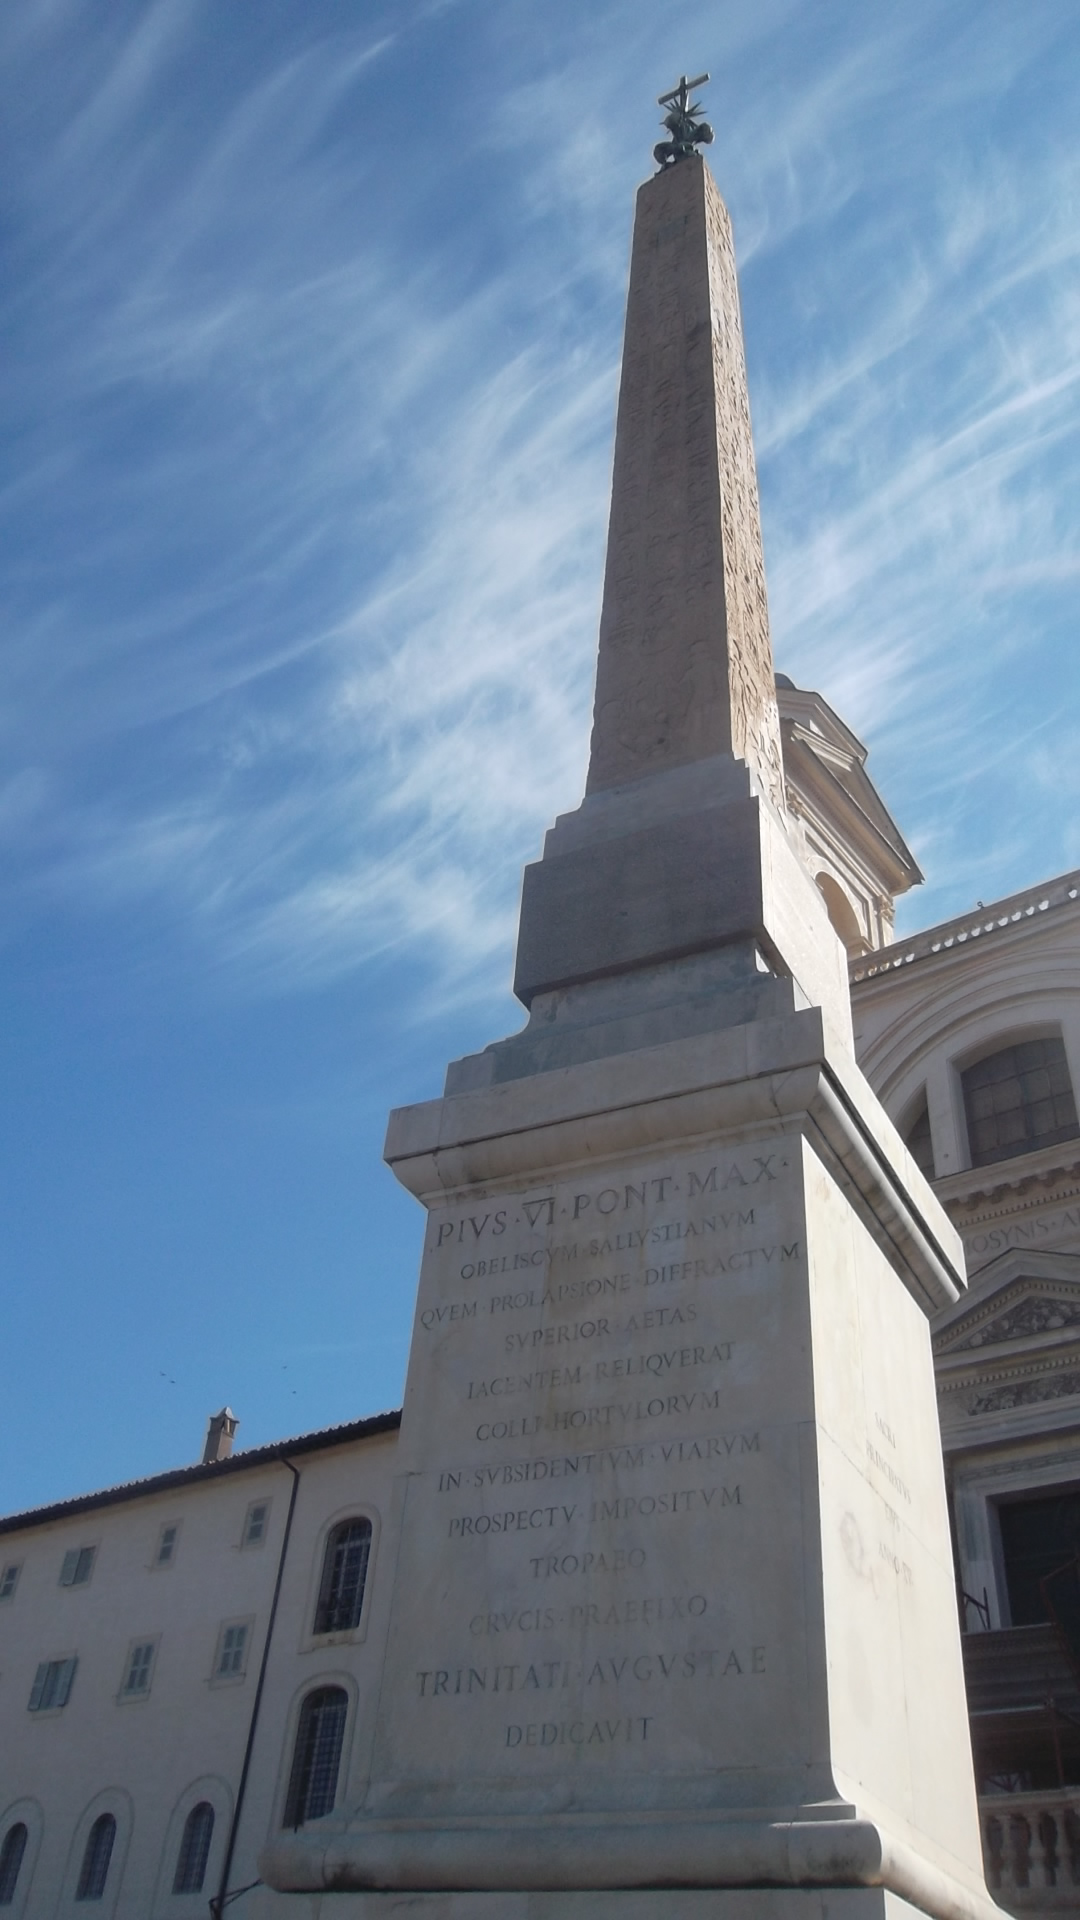 roma-church-trinite-des-monts-obelisk-closeup-aug13